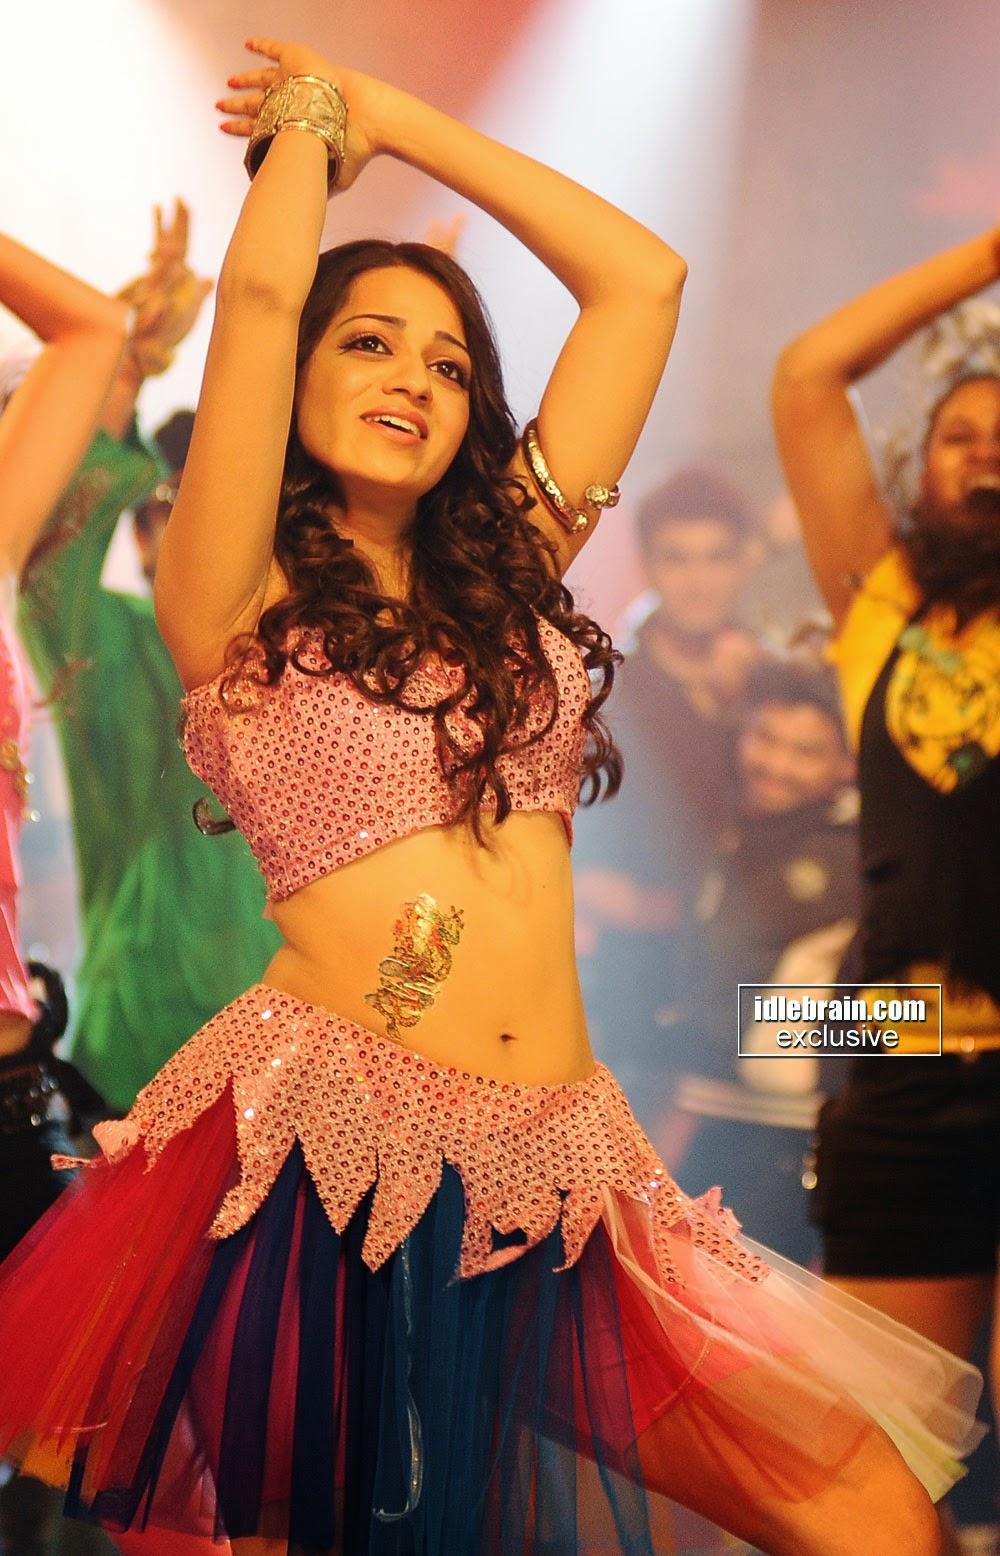 reshma dance